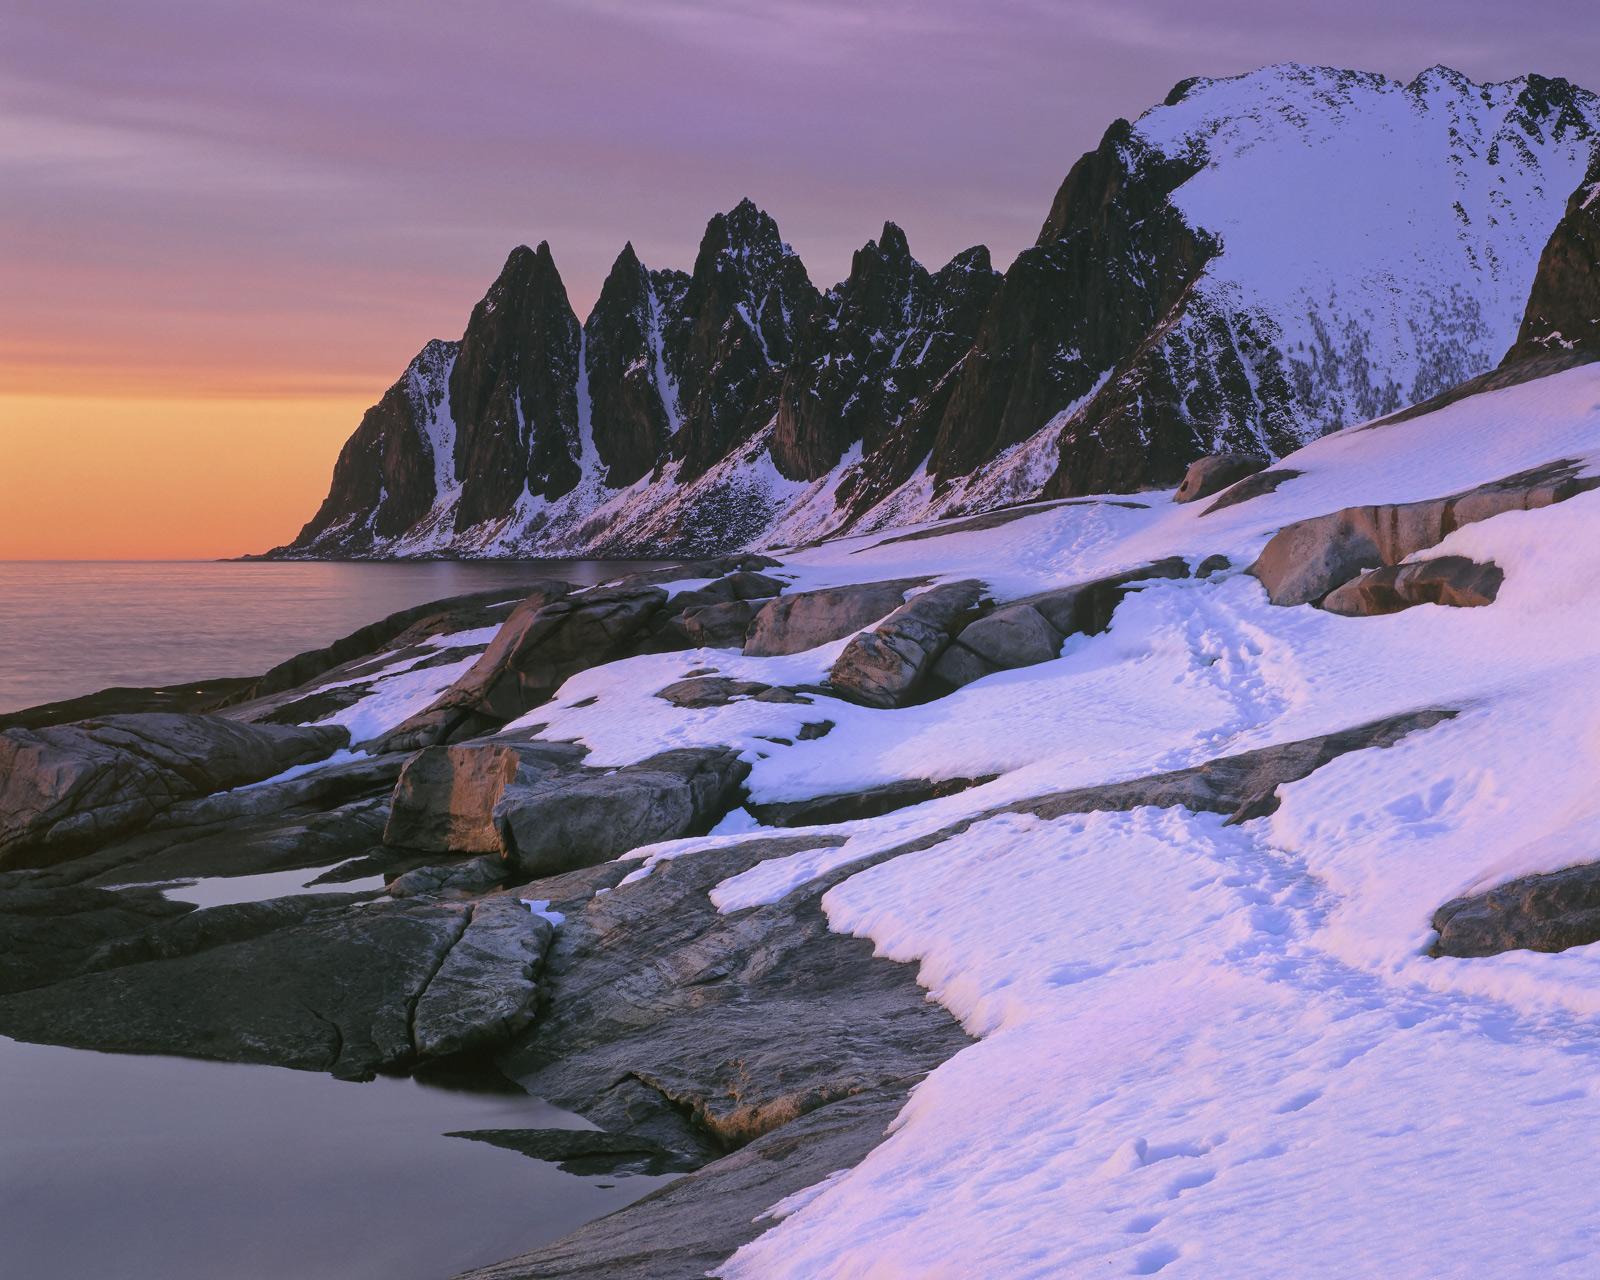 Tangerine Teeth, Tungeneset, Senja, Norway, evening, sunset, light, radiant glow, snow, blue, crimson, Devils Teeth, win, photo